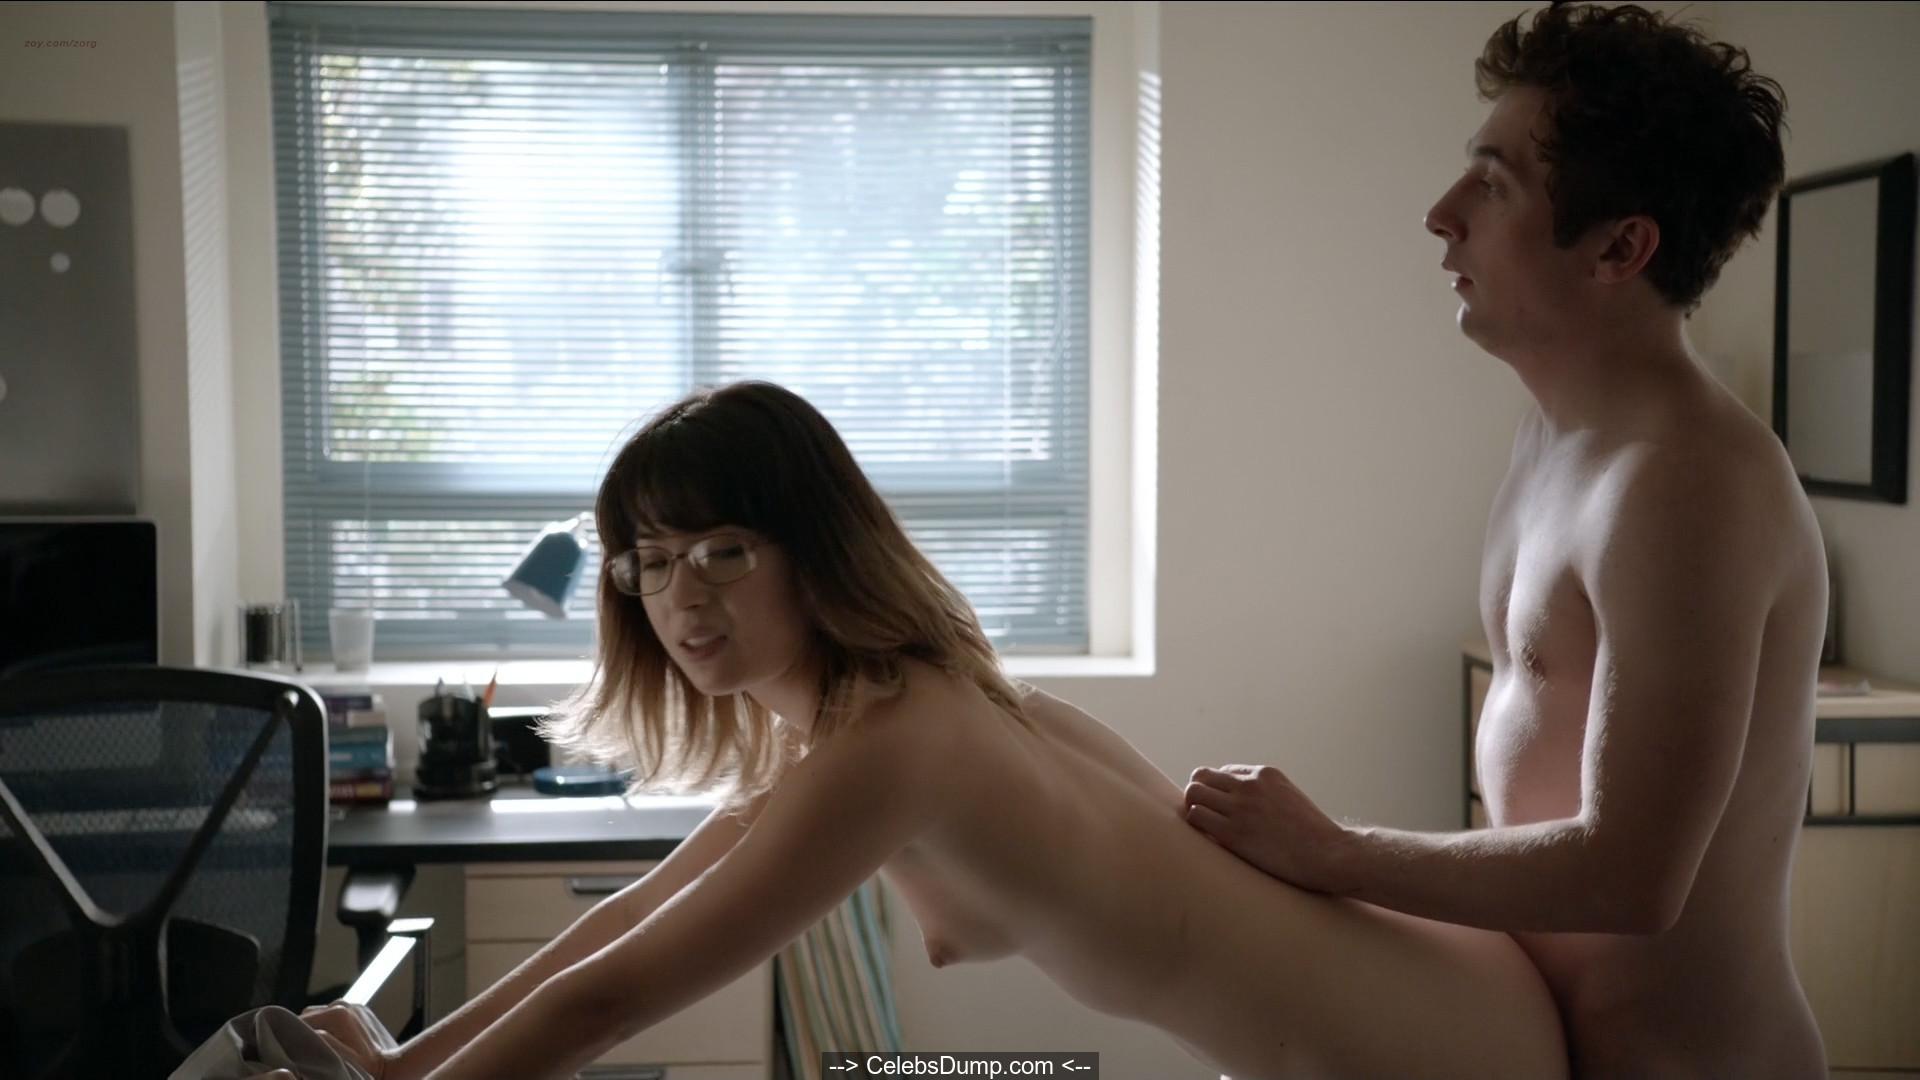 Kate Miner Nude Car Sex